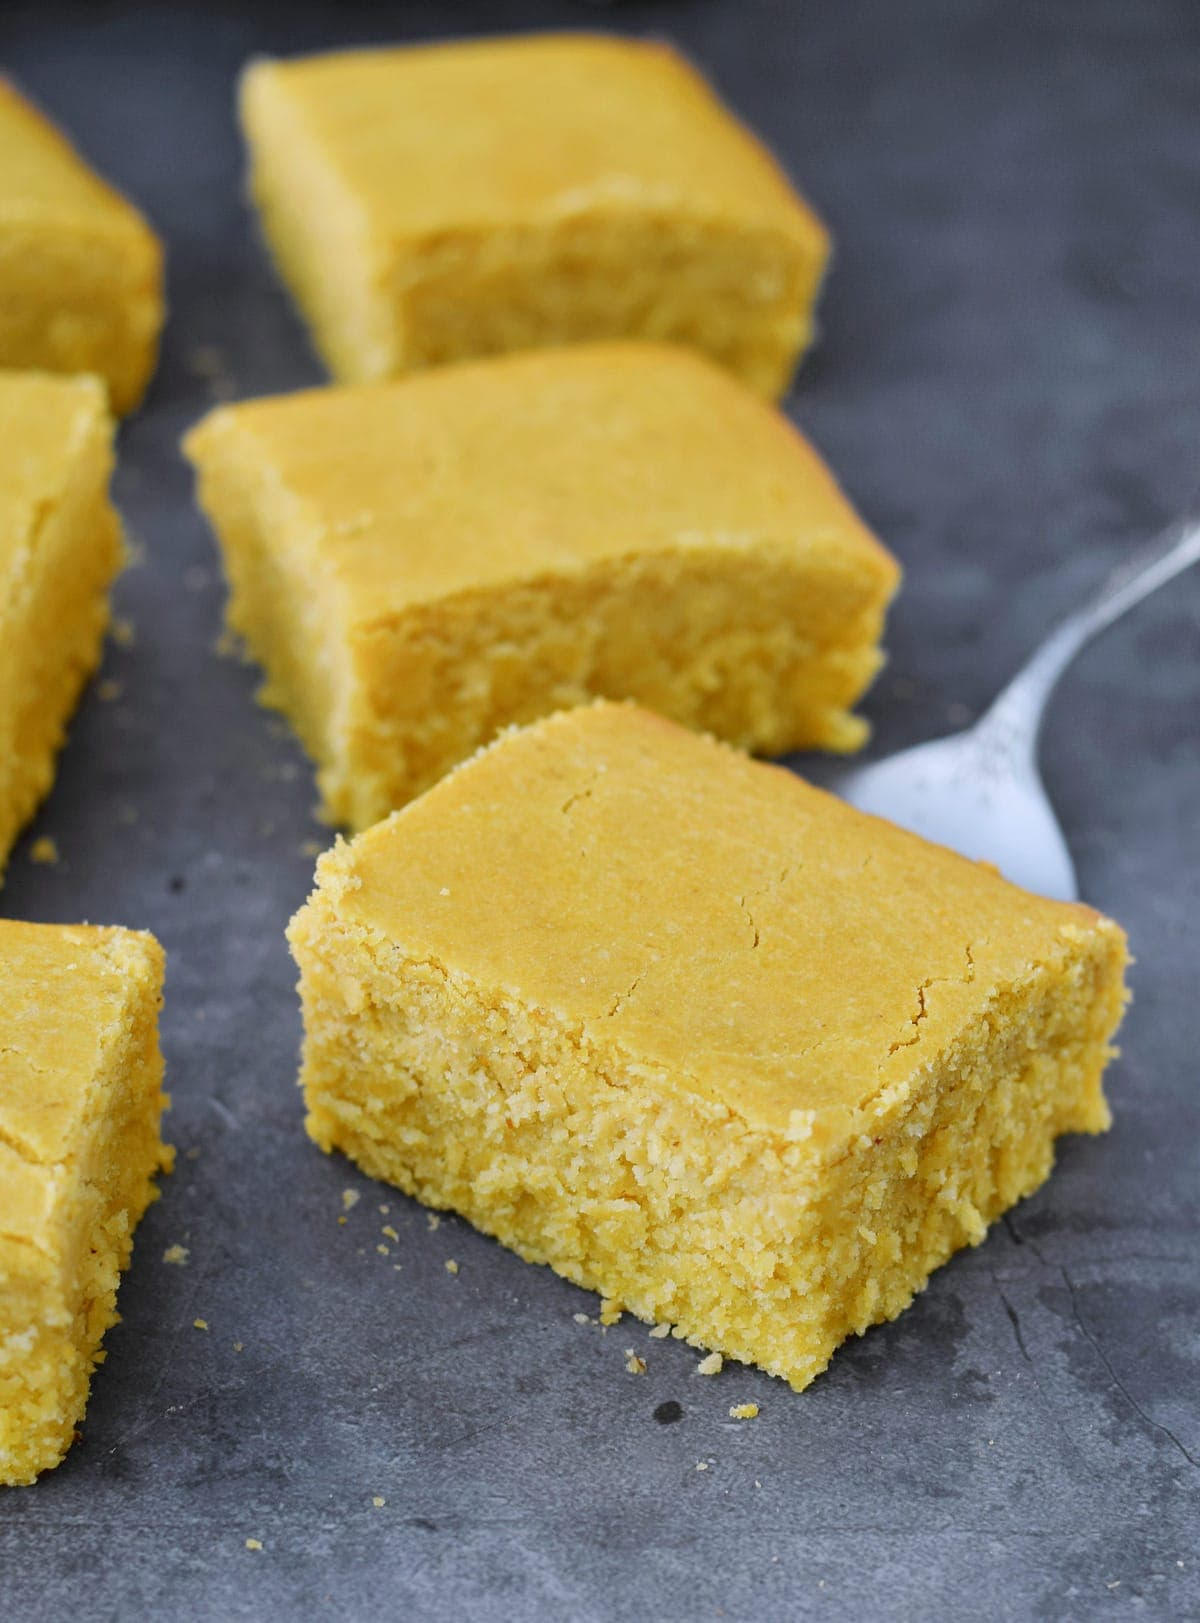 gelbes Brot in Stücke geschnitten